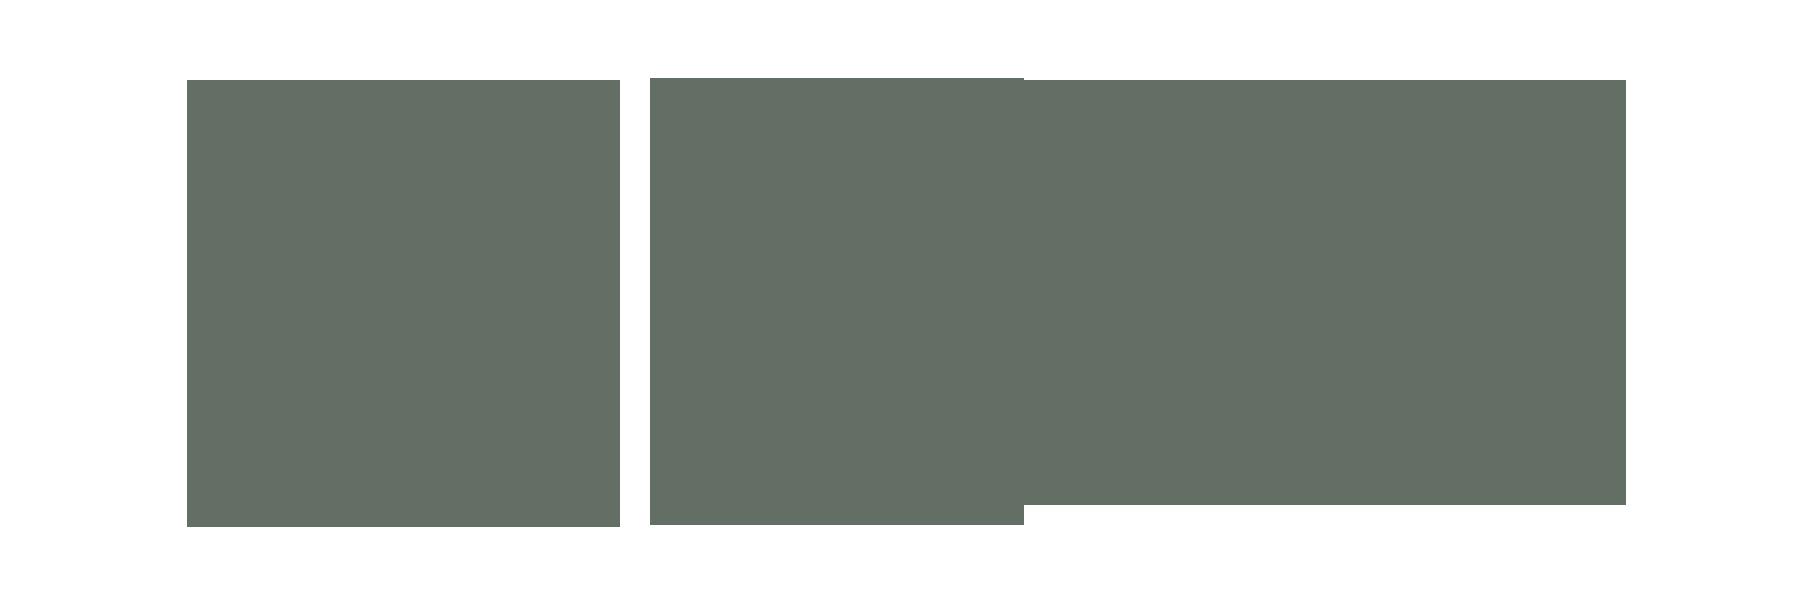 gibberd-garden